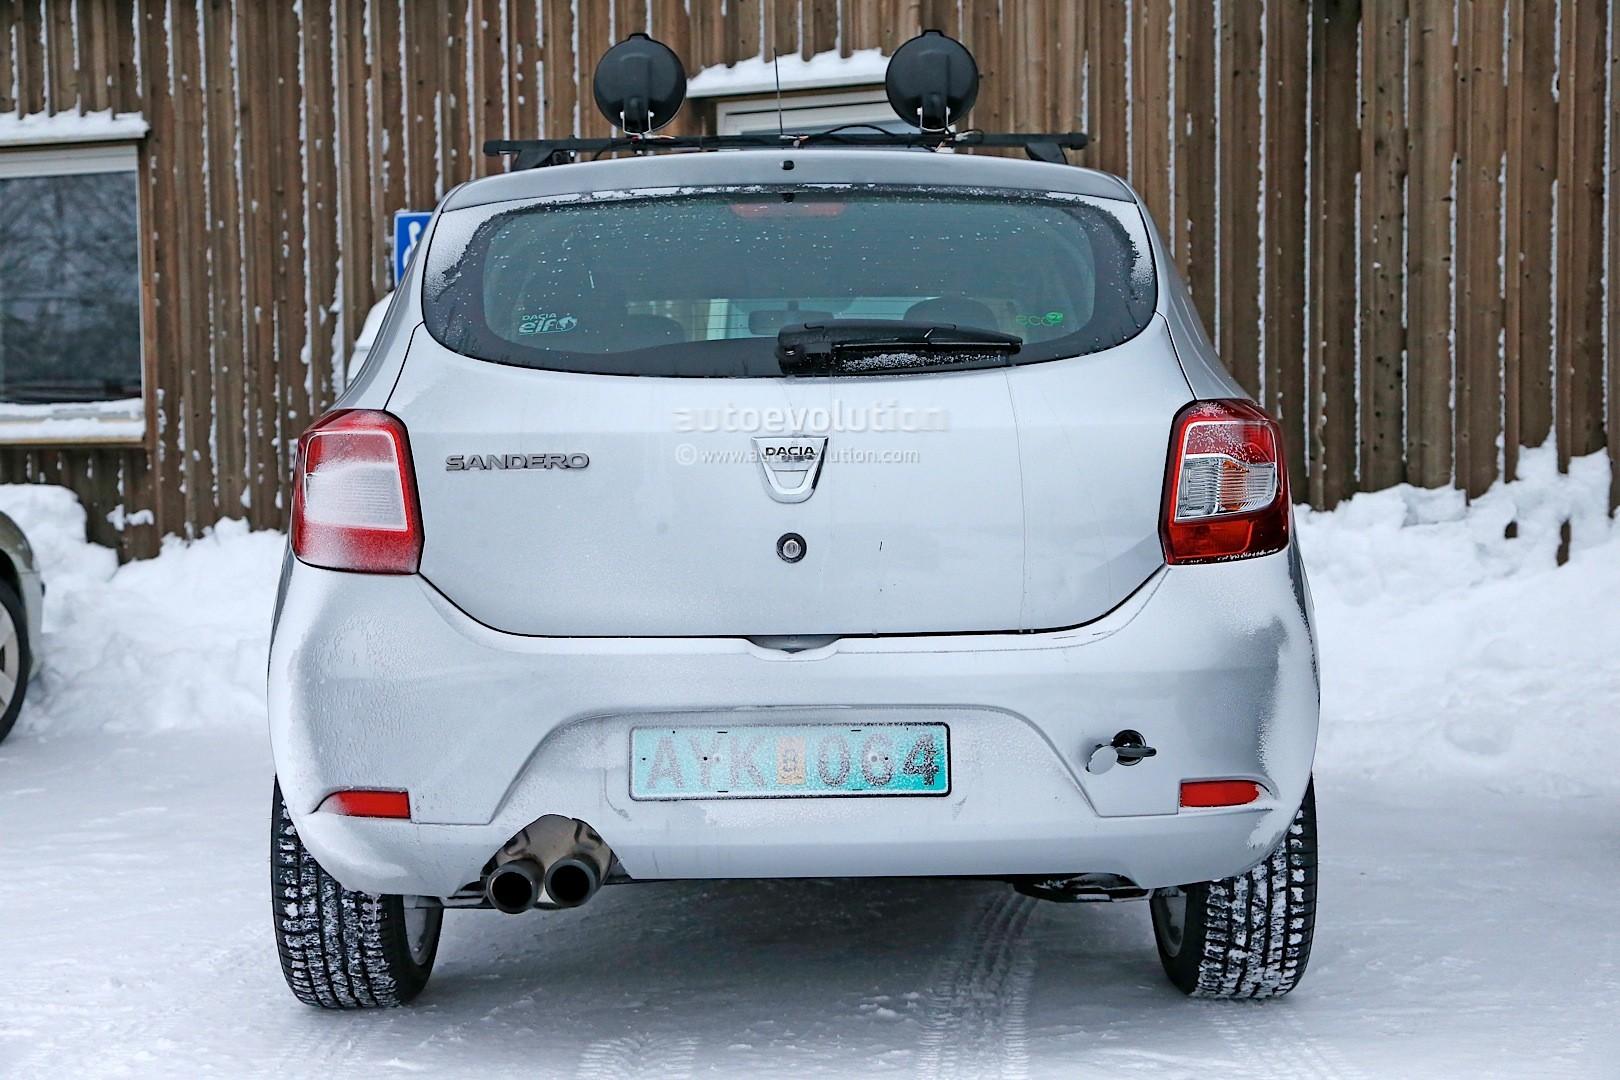 2012 - [Dacia] Sandero II - Page 14 Spyshots-dacia-sandero-rs-getting-12-turbo-engine-sportier-interior_6